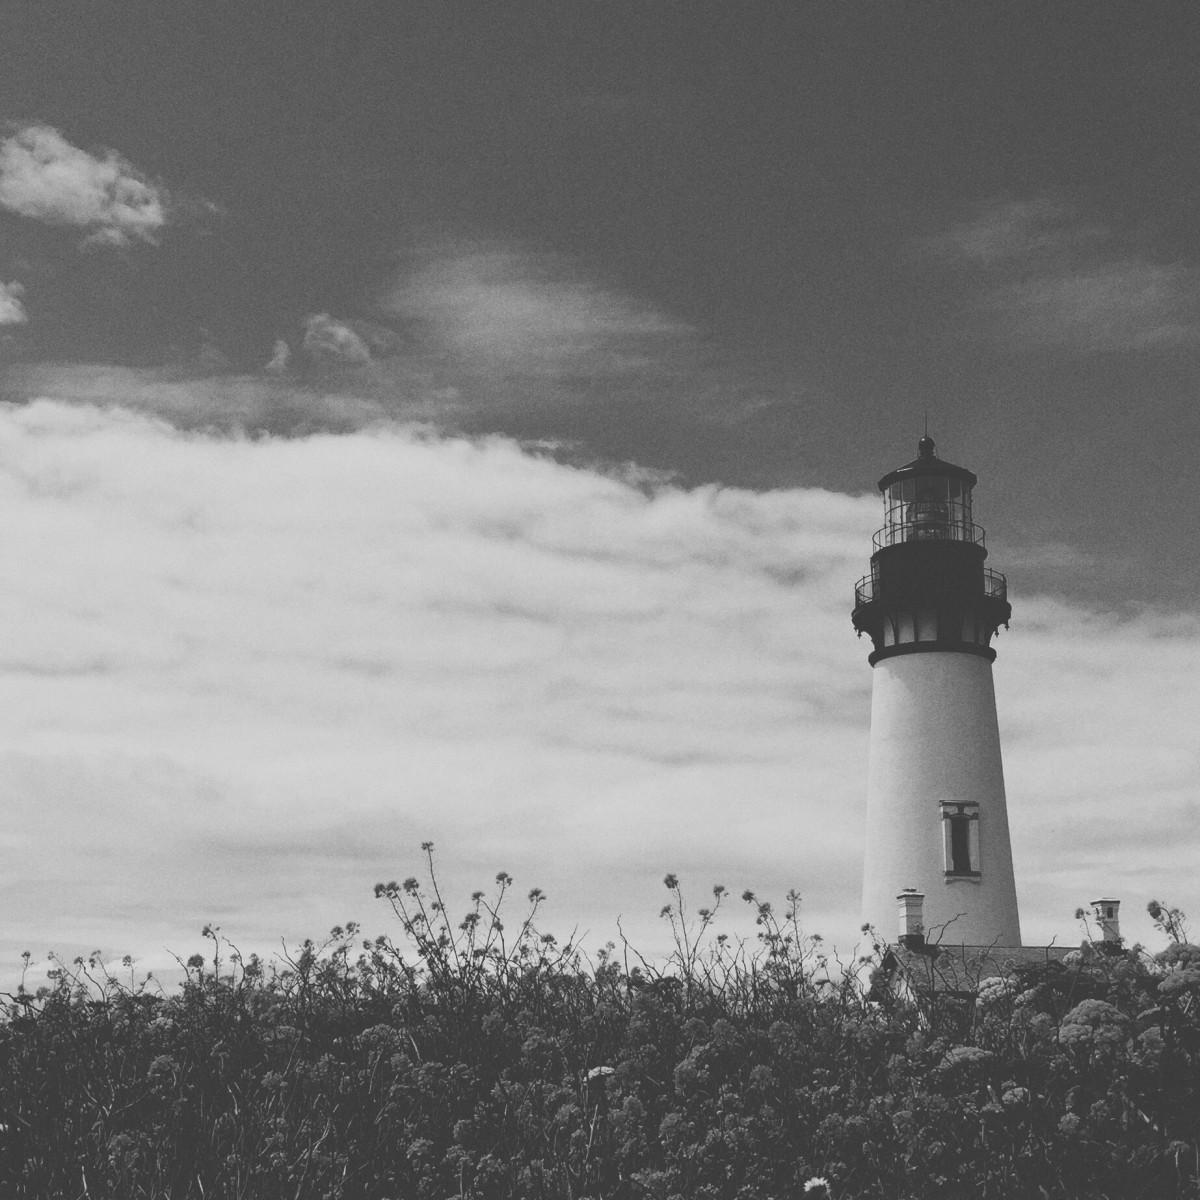 Free Images : Sea, Coast, Black And White, Lighthouse